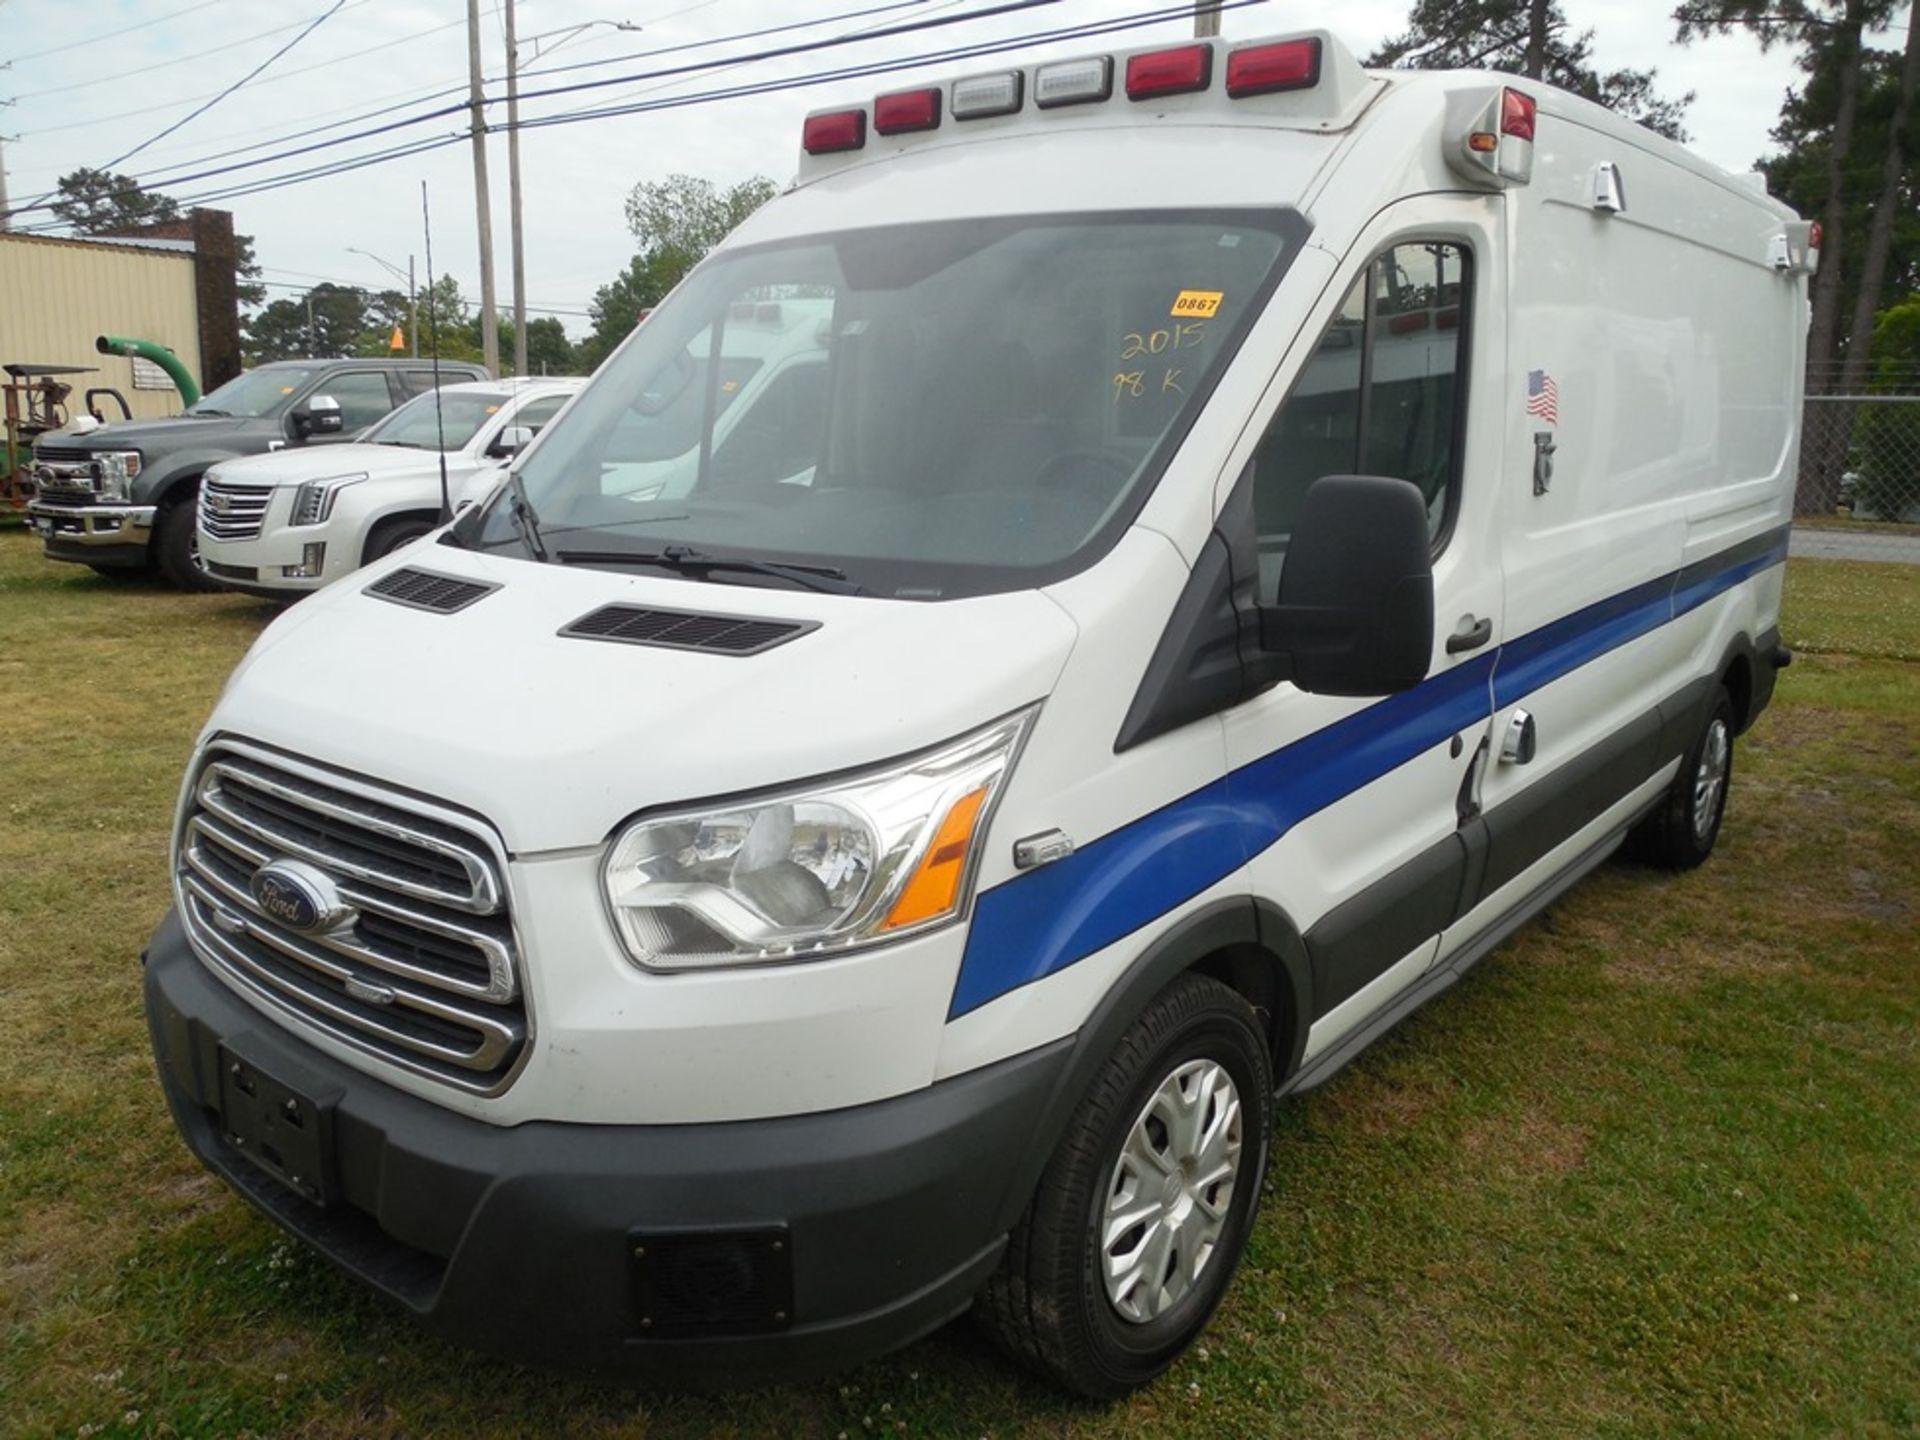 2015 Ford Tansit 250 dsl ambulance 98,714 miles vin# 1FDYR2CV4FKB33641 - Image 2 of 6